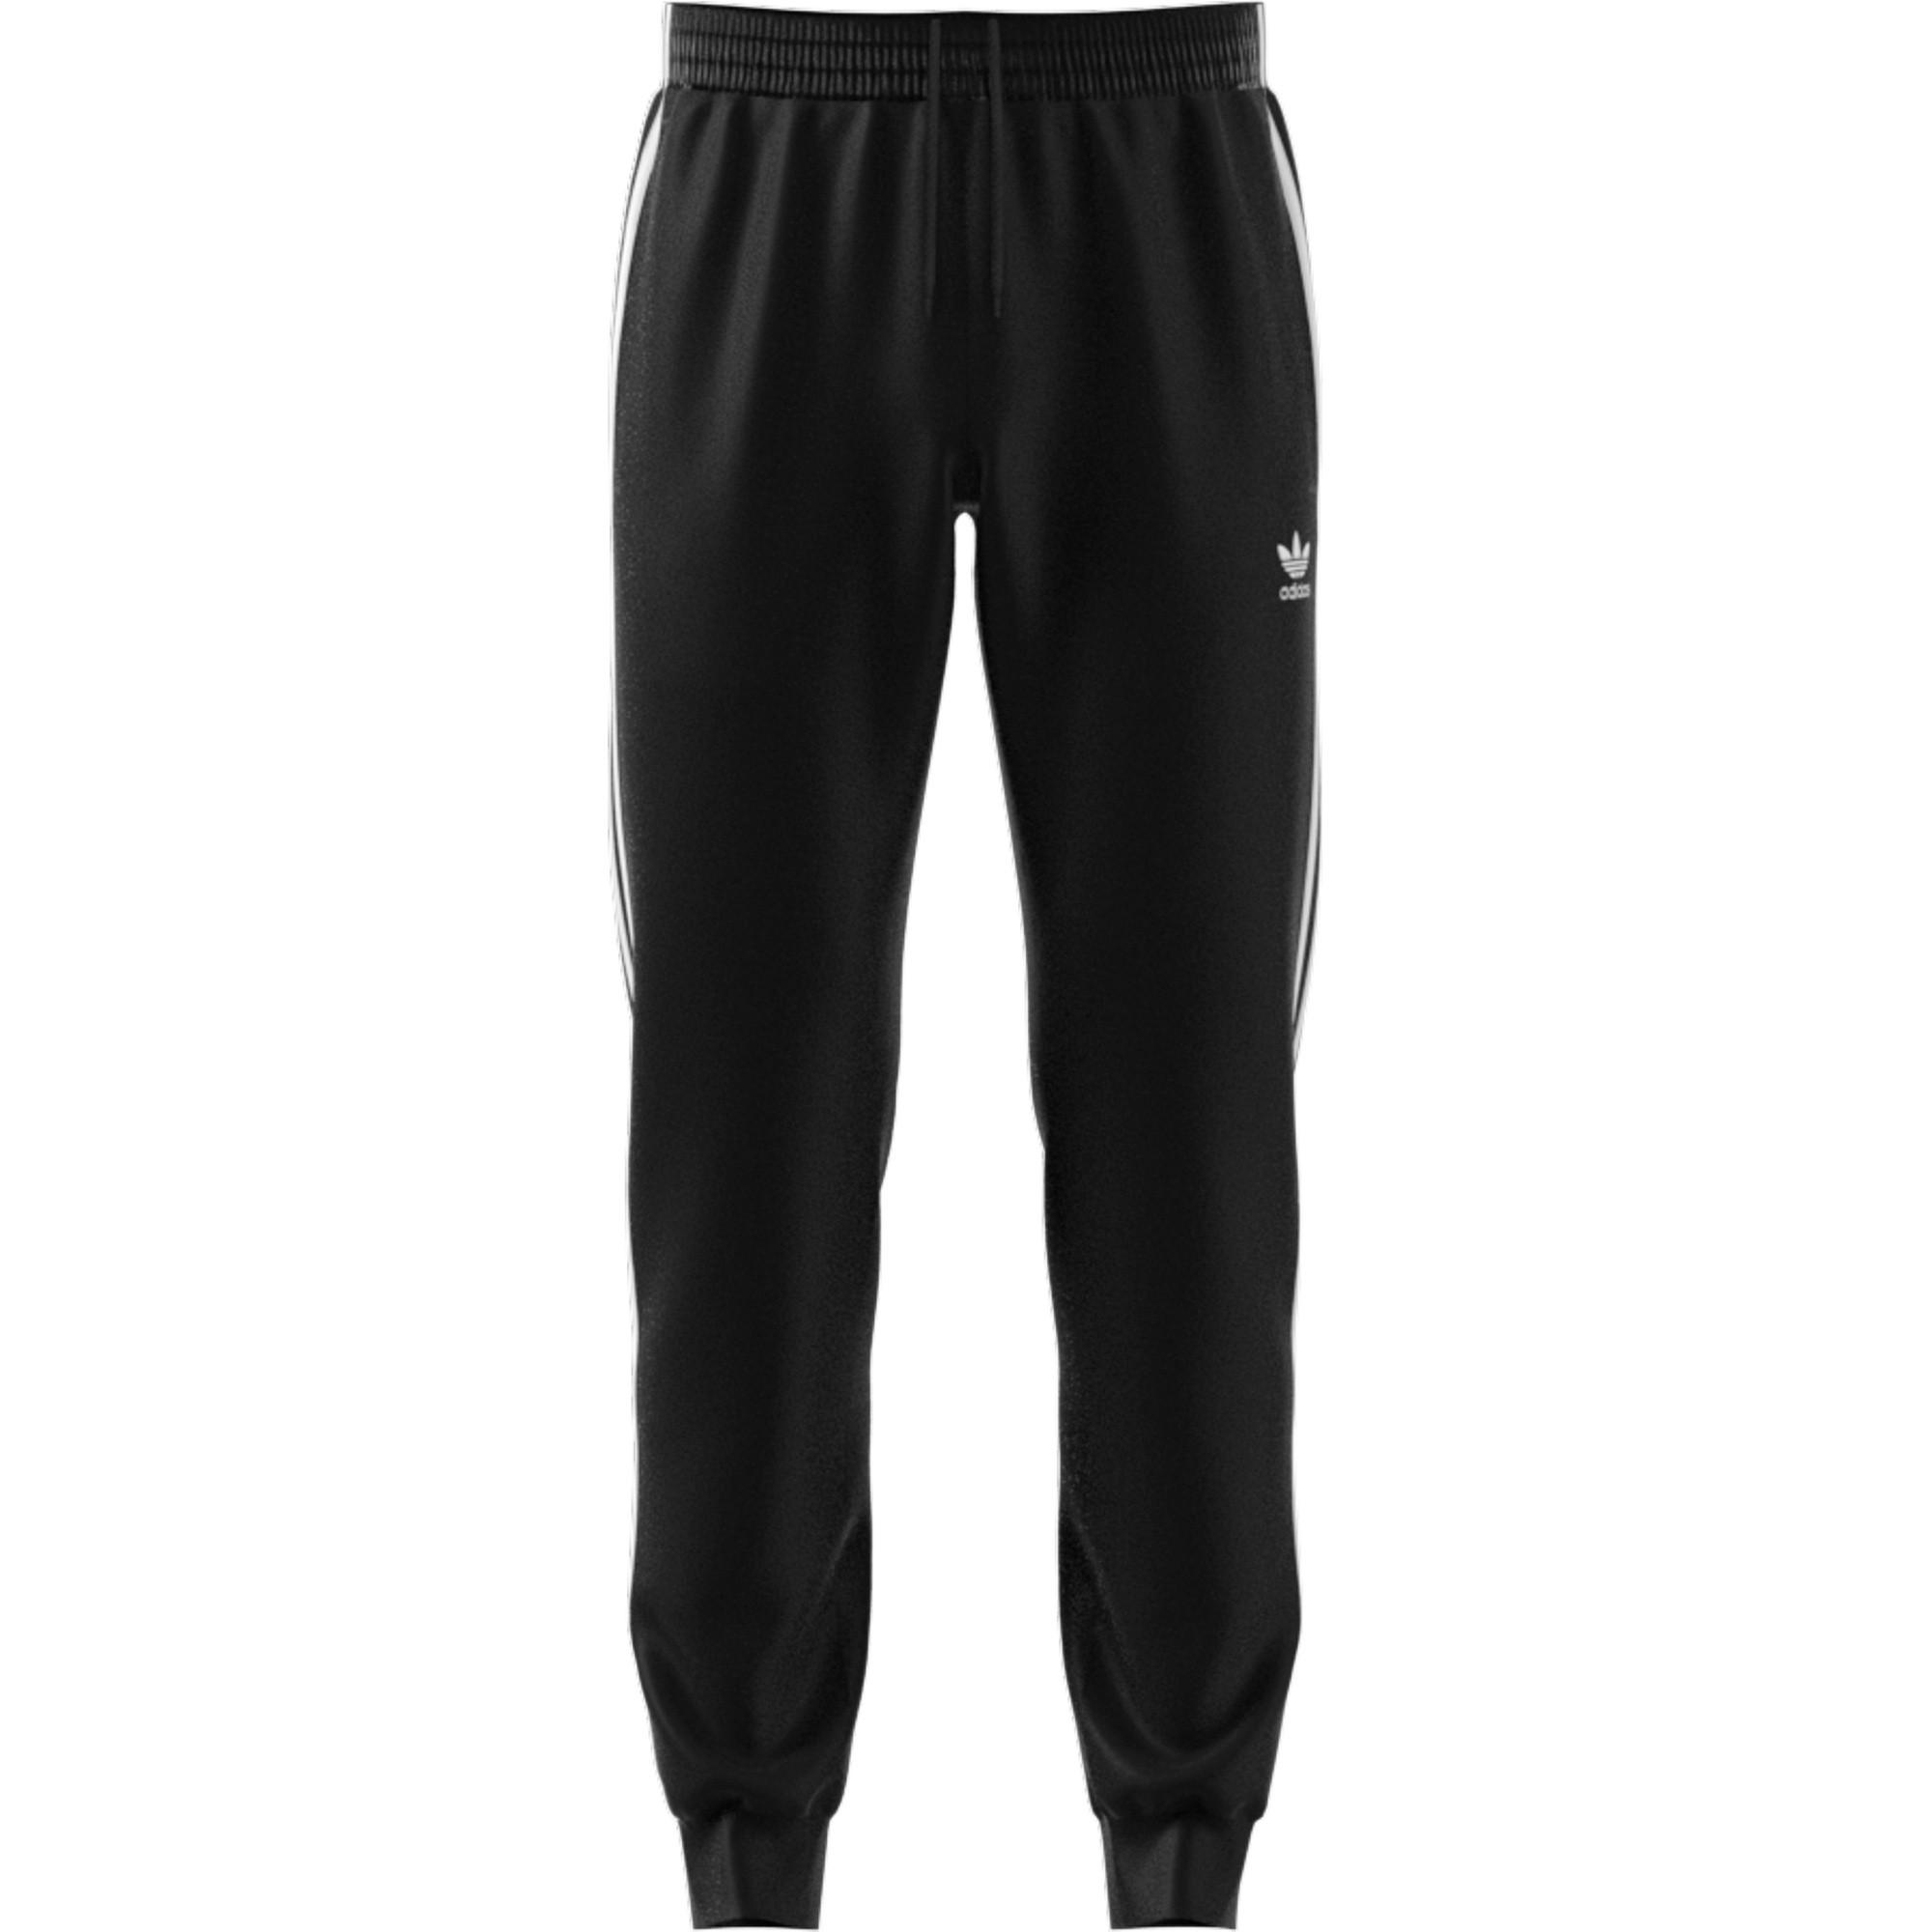 Pantaloni tuta adicolor Classics Primeblue SST, Bianco/Nero, large image number 0